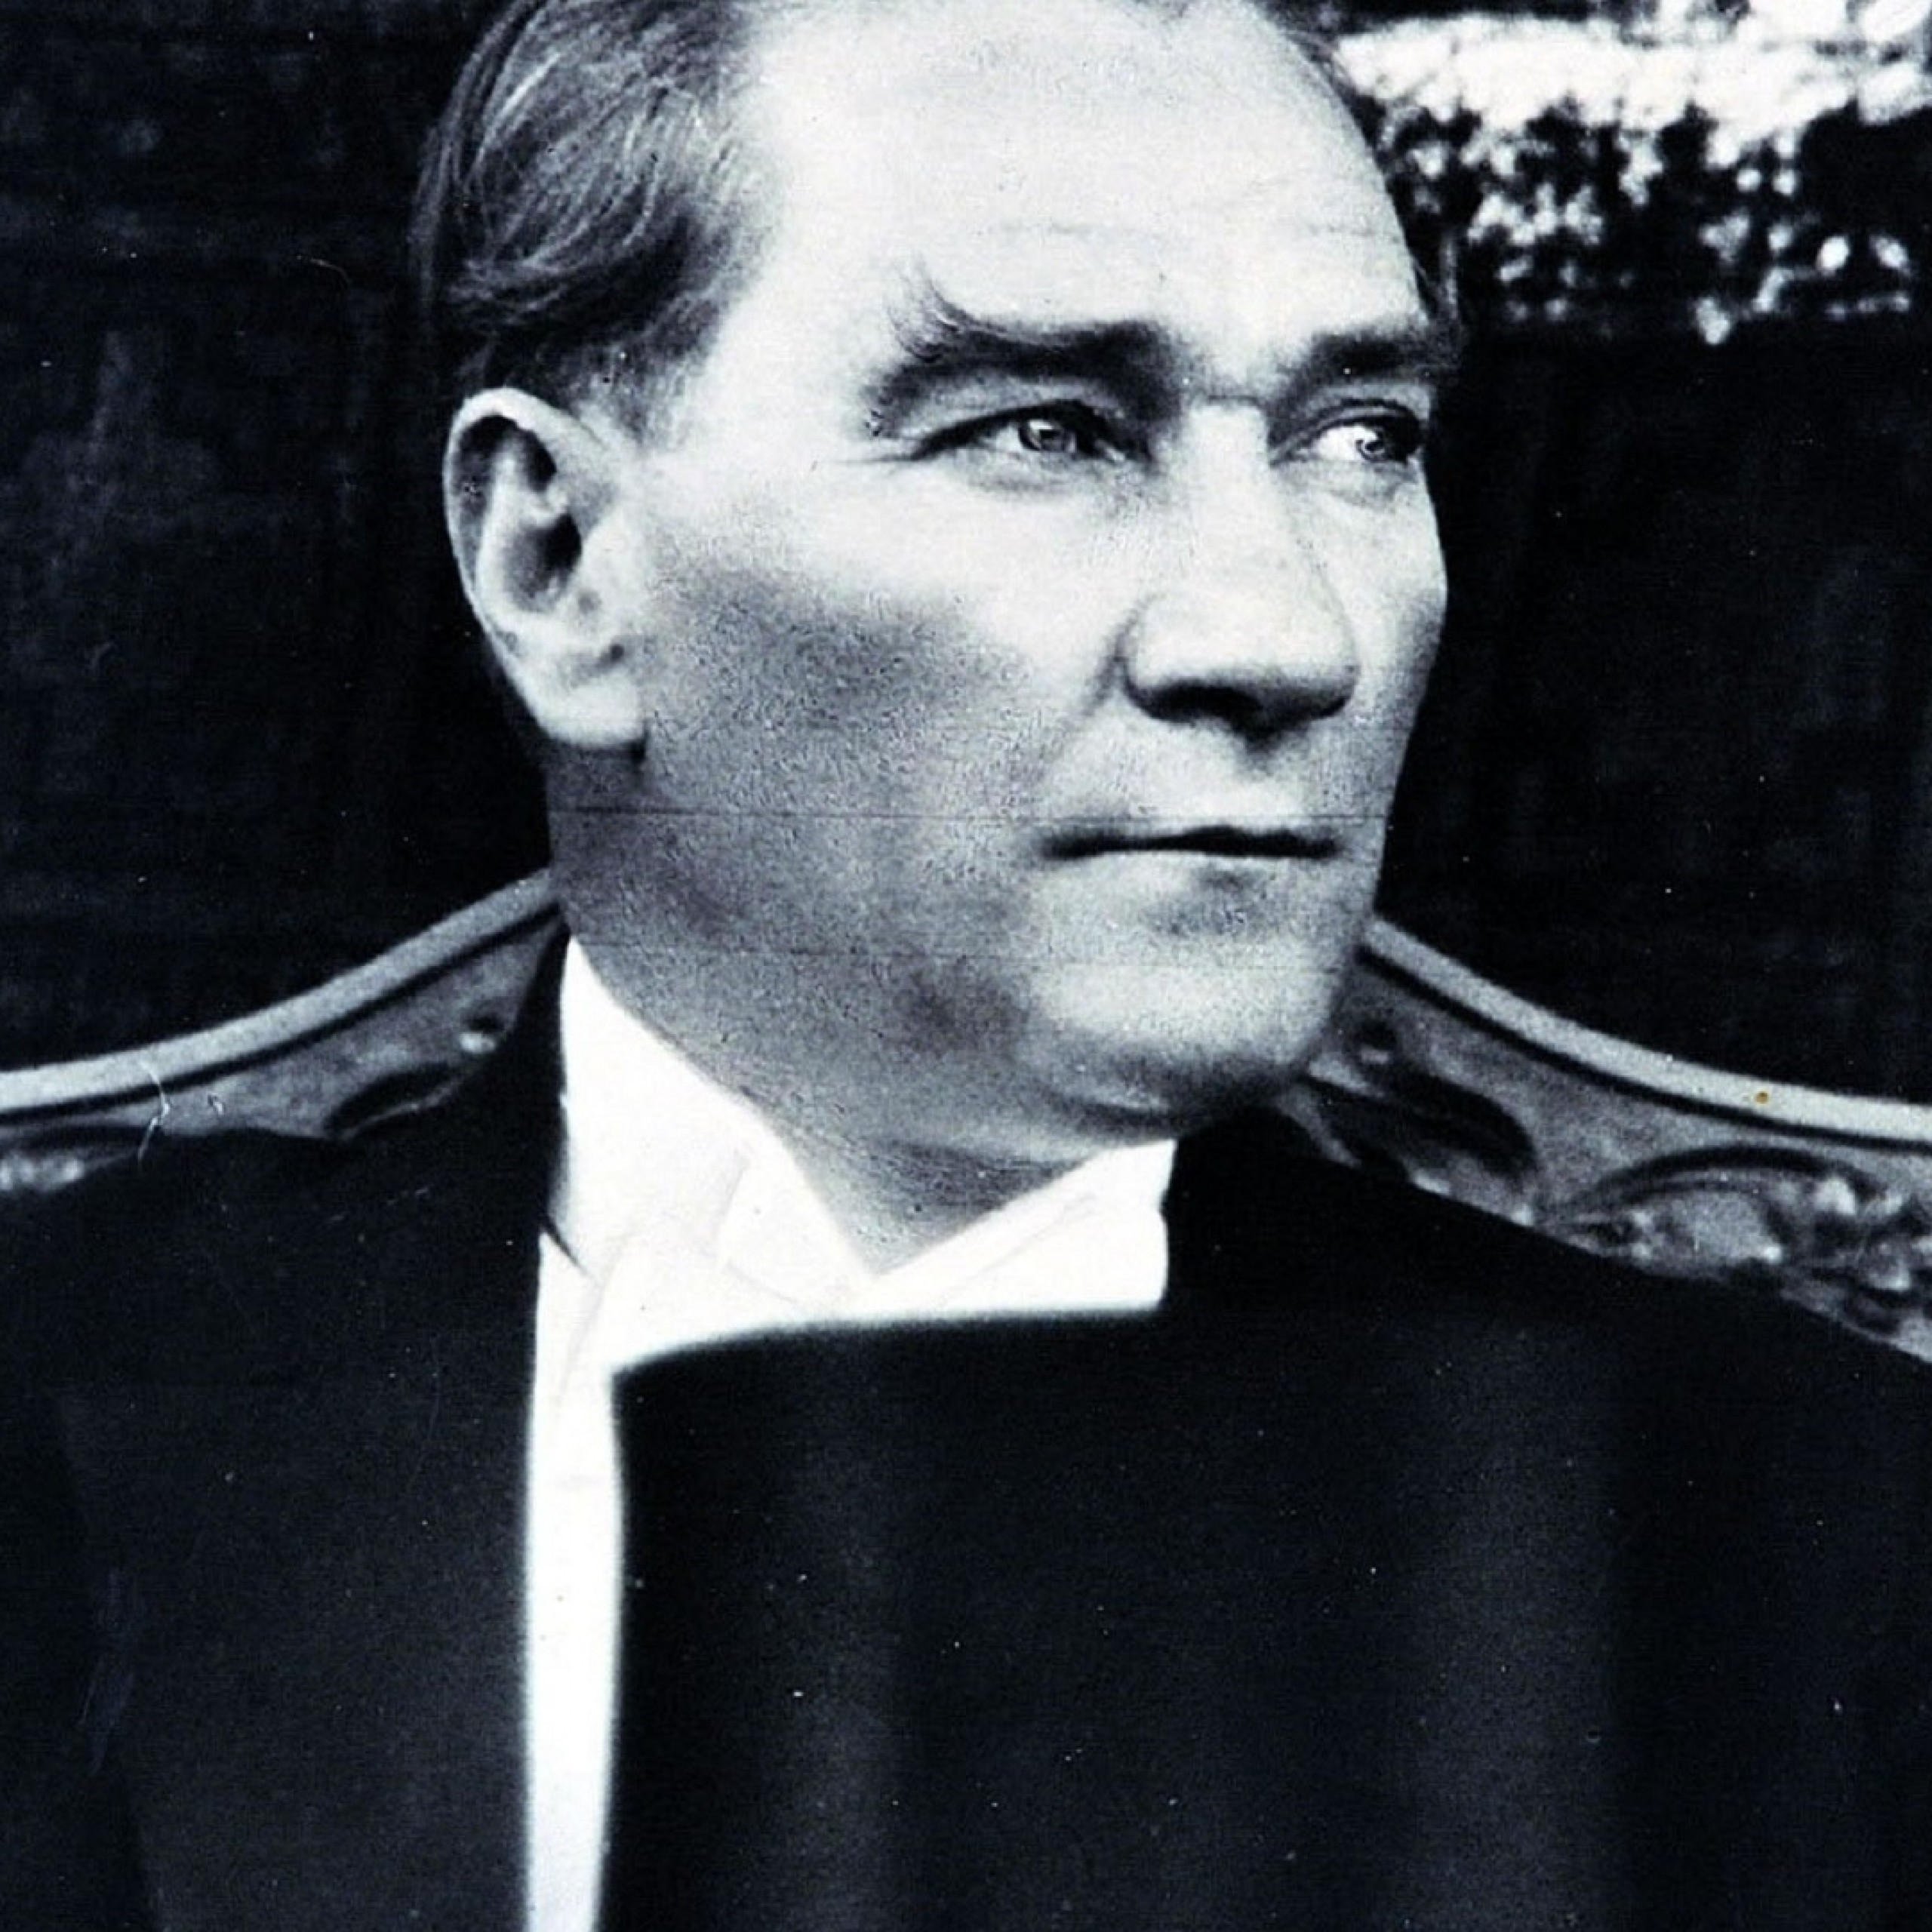 Atatürk hd wallpaper